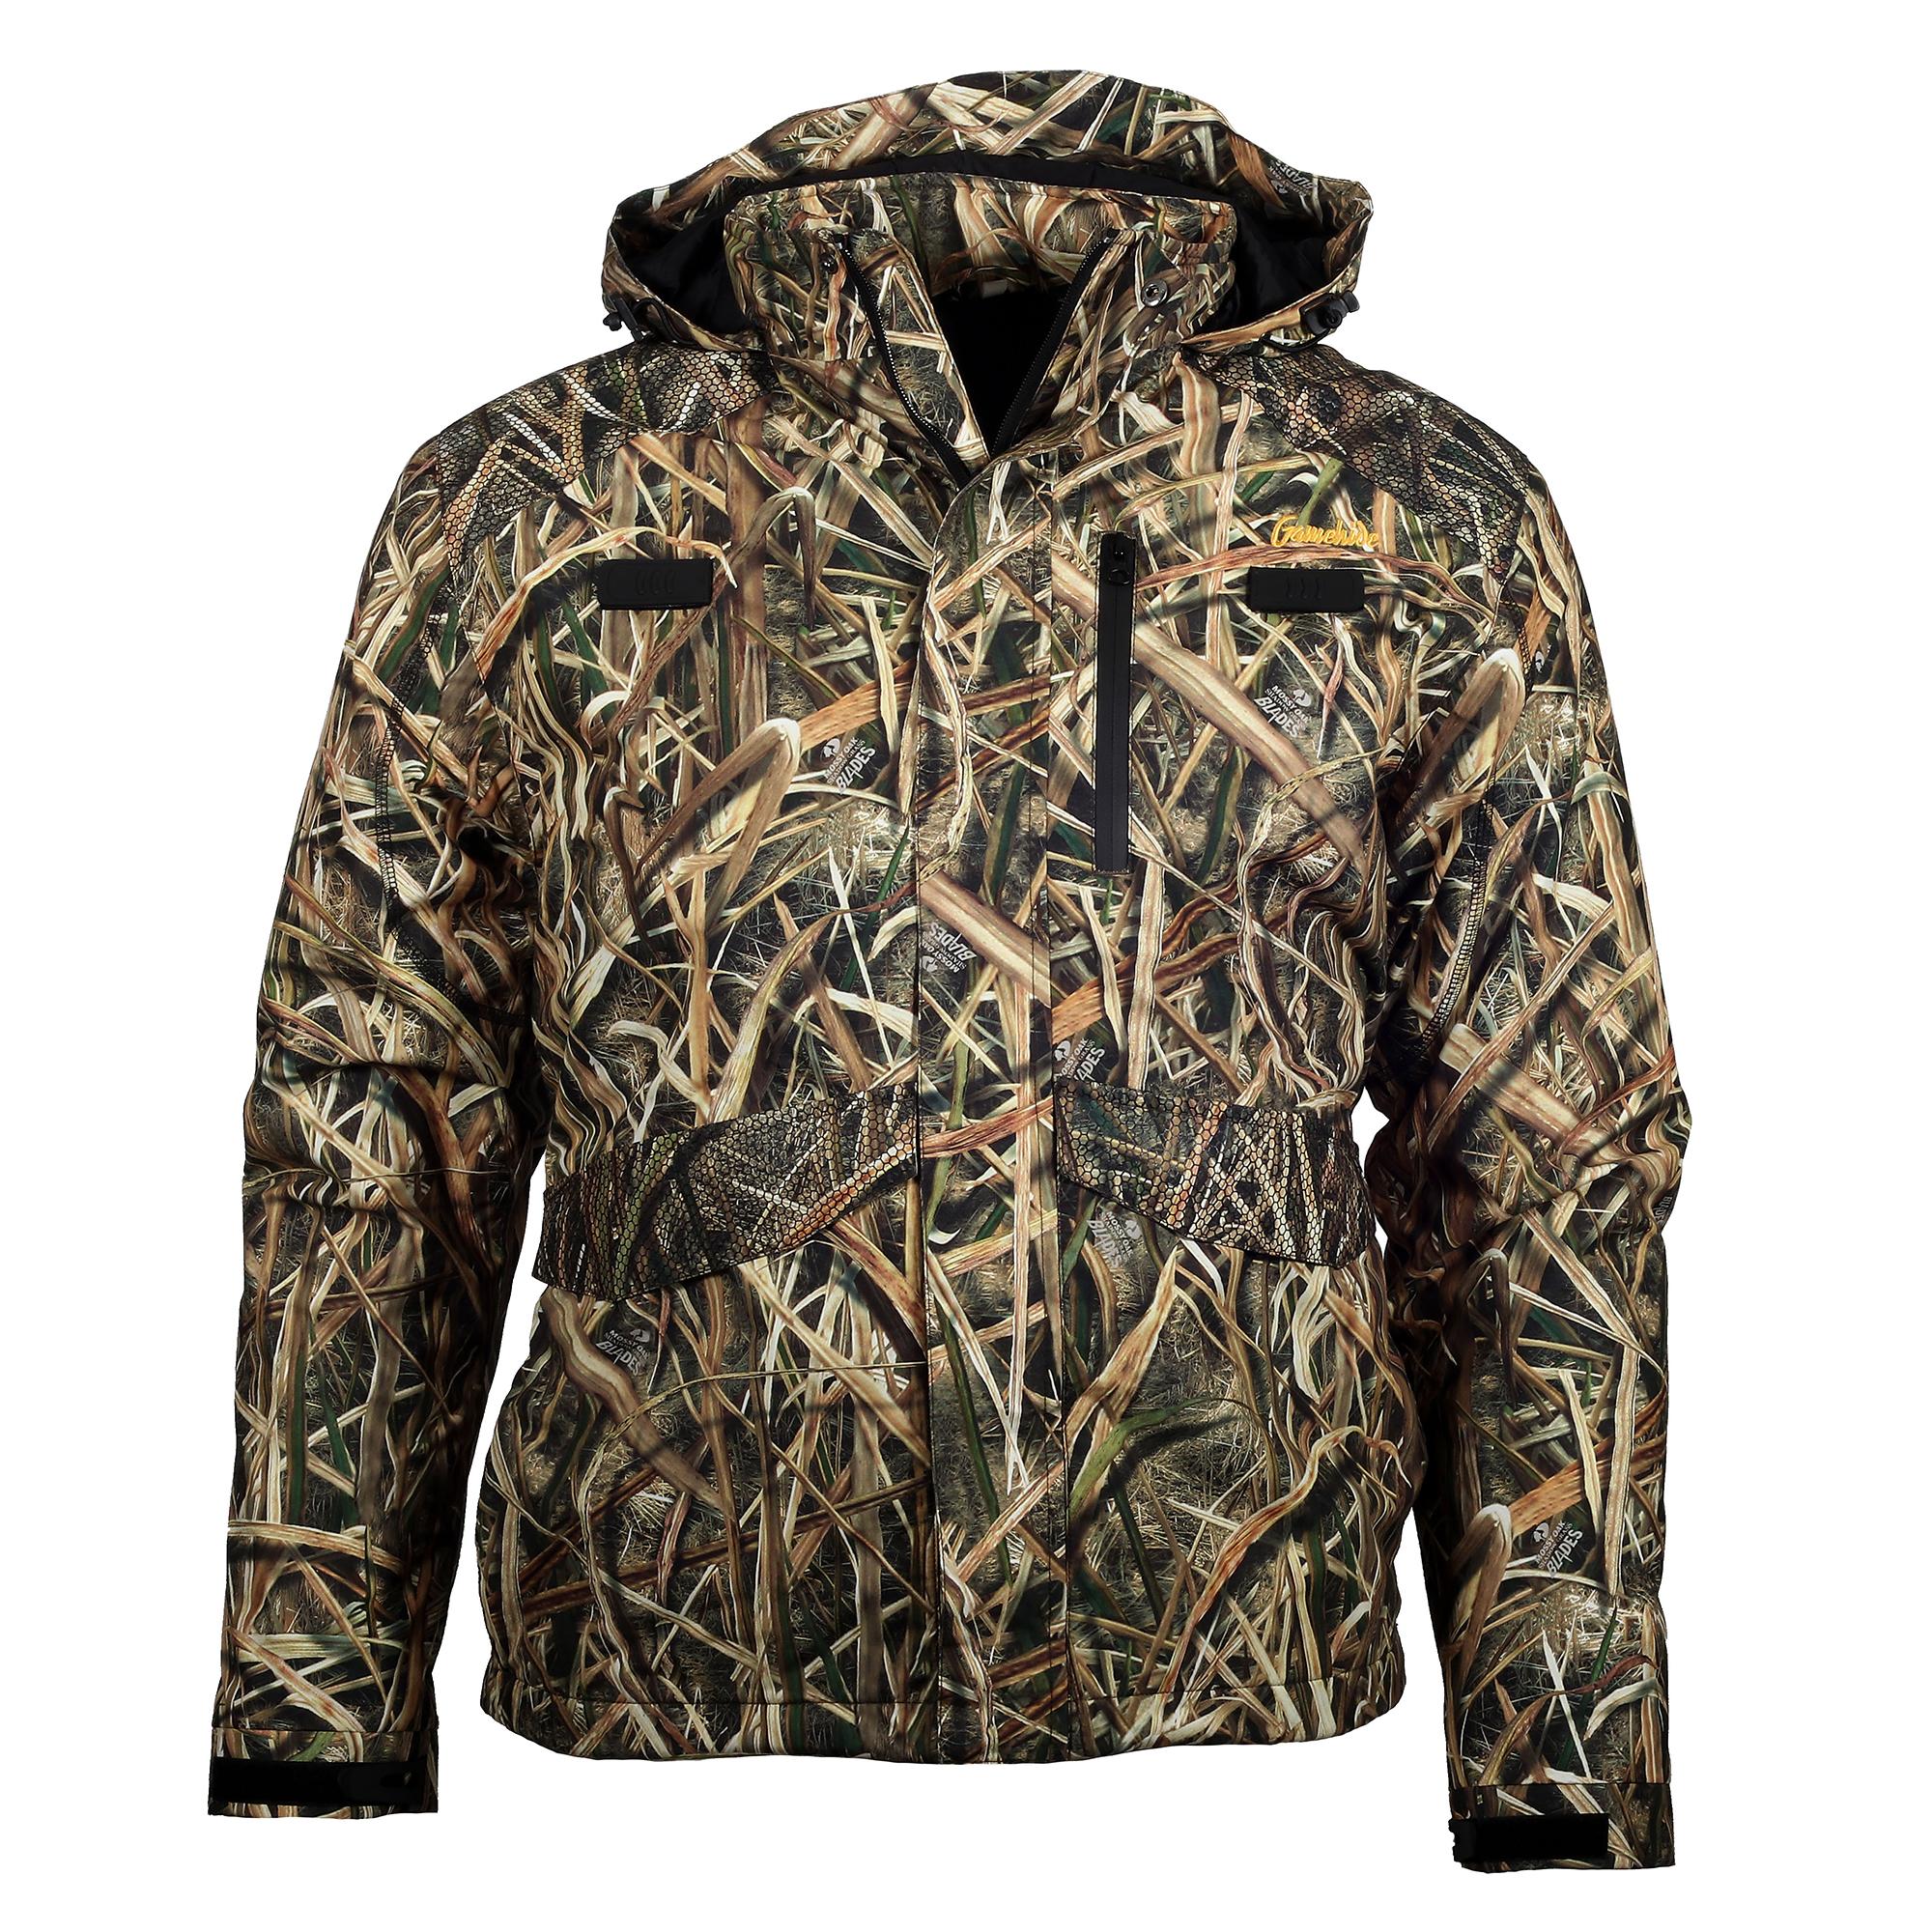 Gamehide Men's Slough Creek Jacket